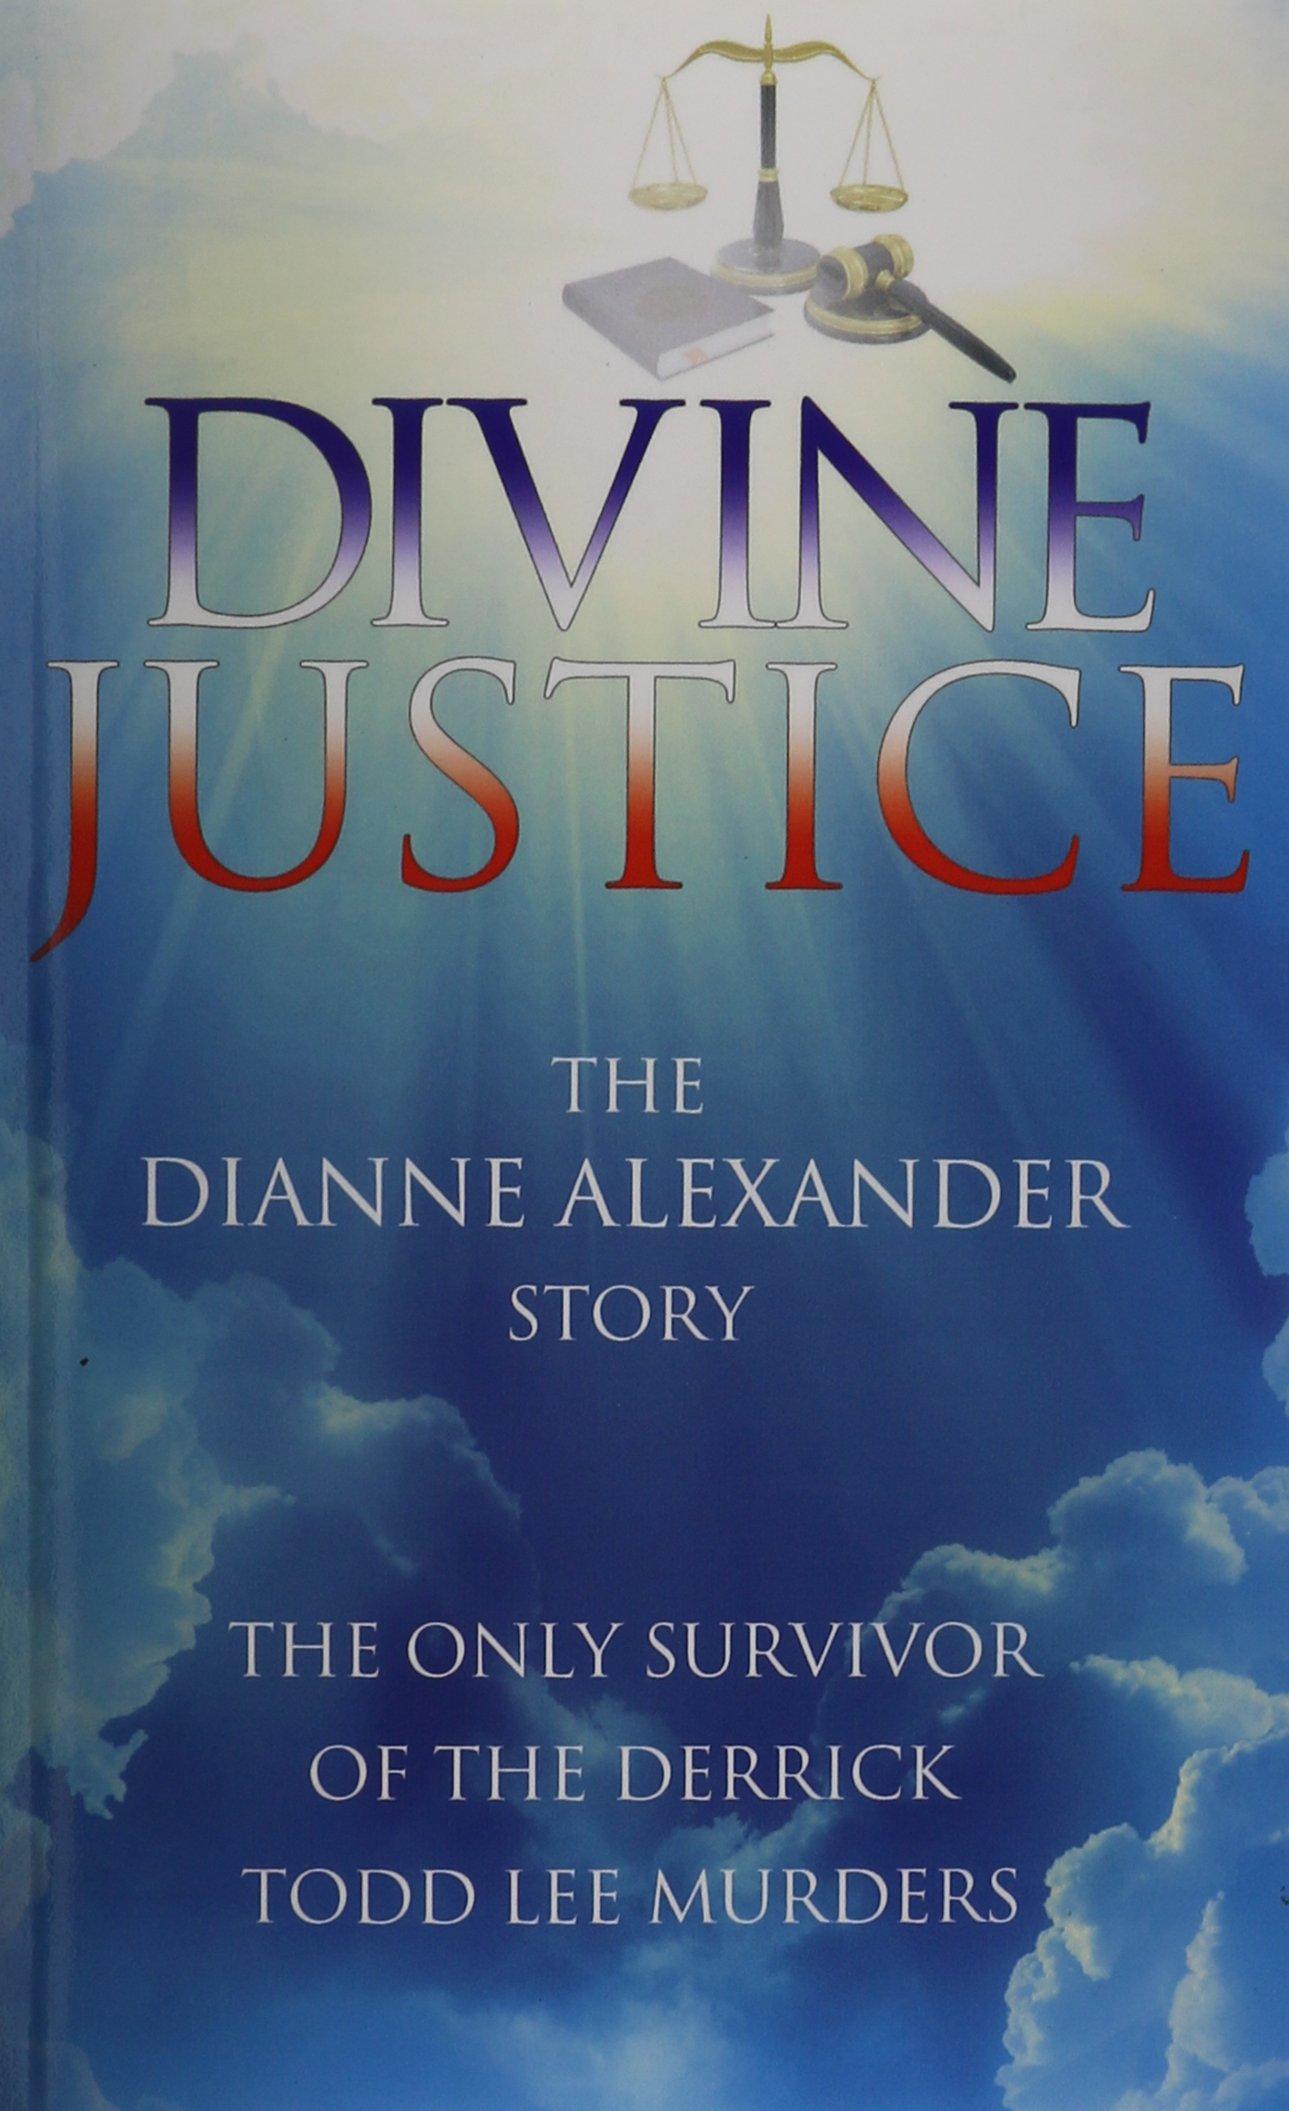 Divine Justice: The Dianne Alexander Story